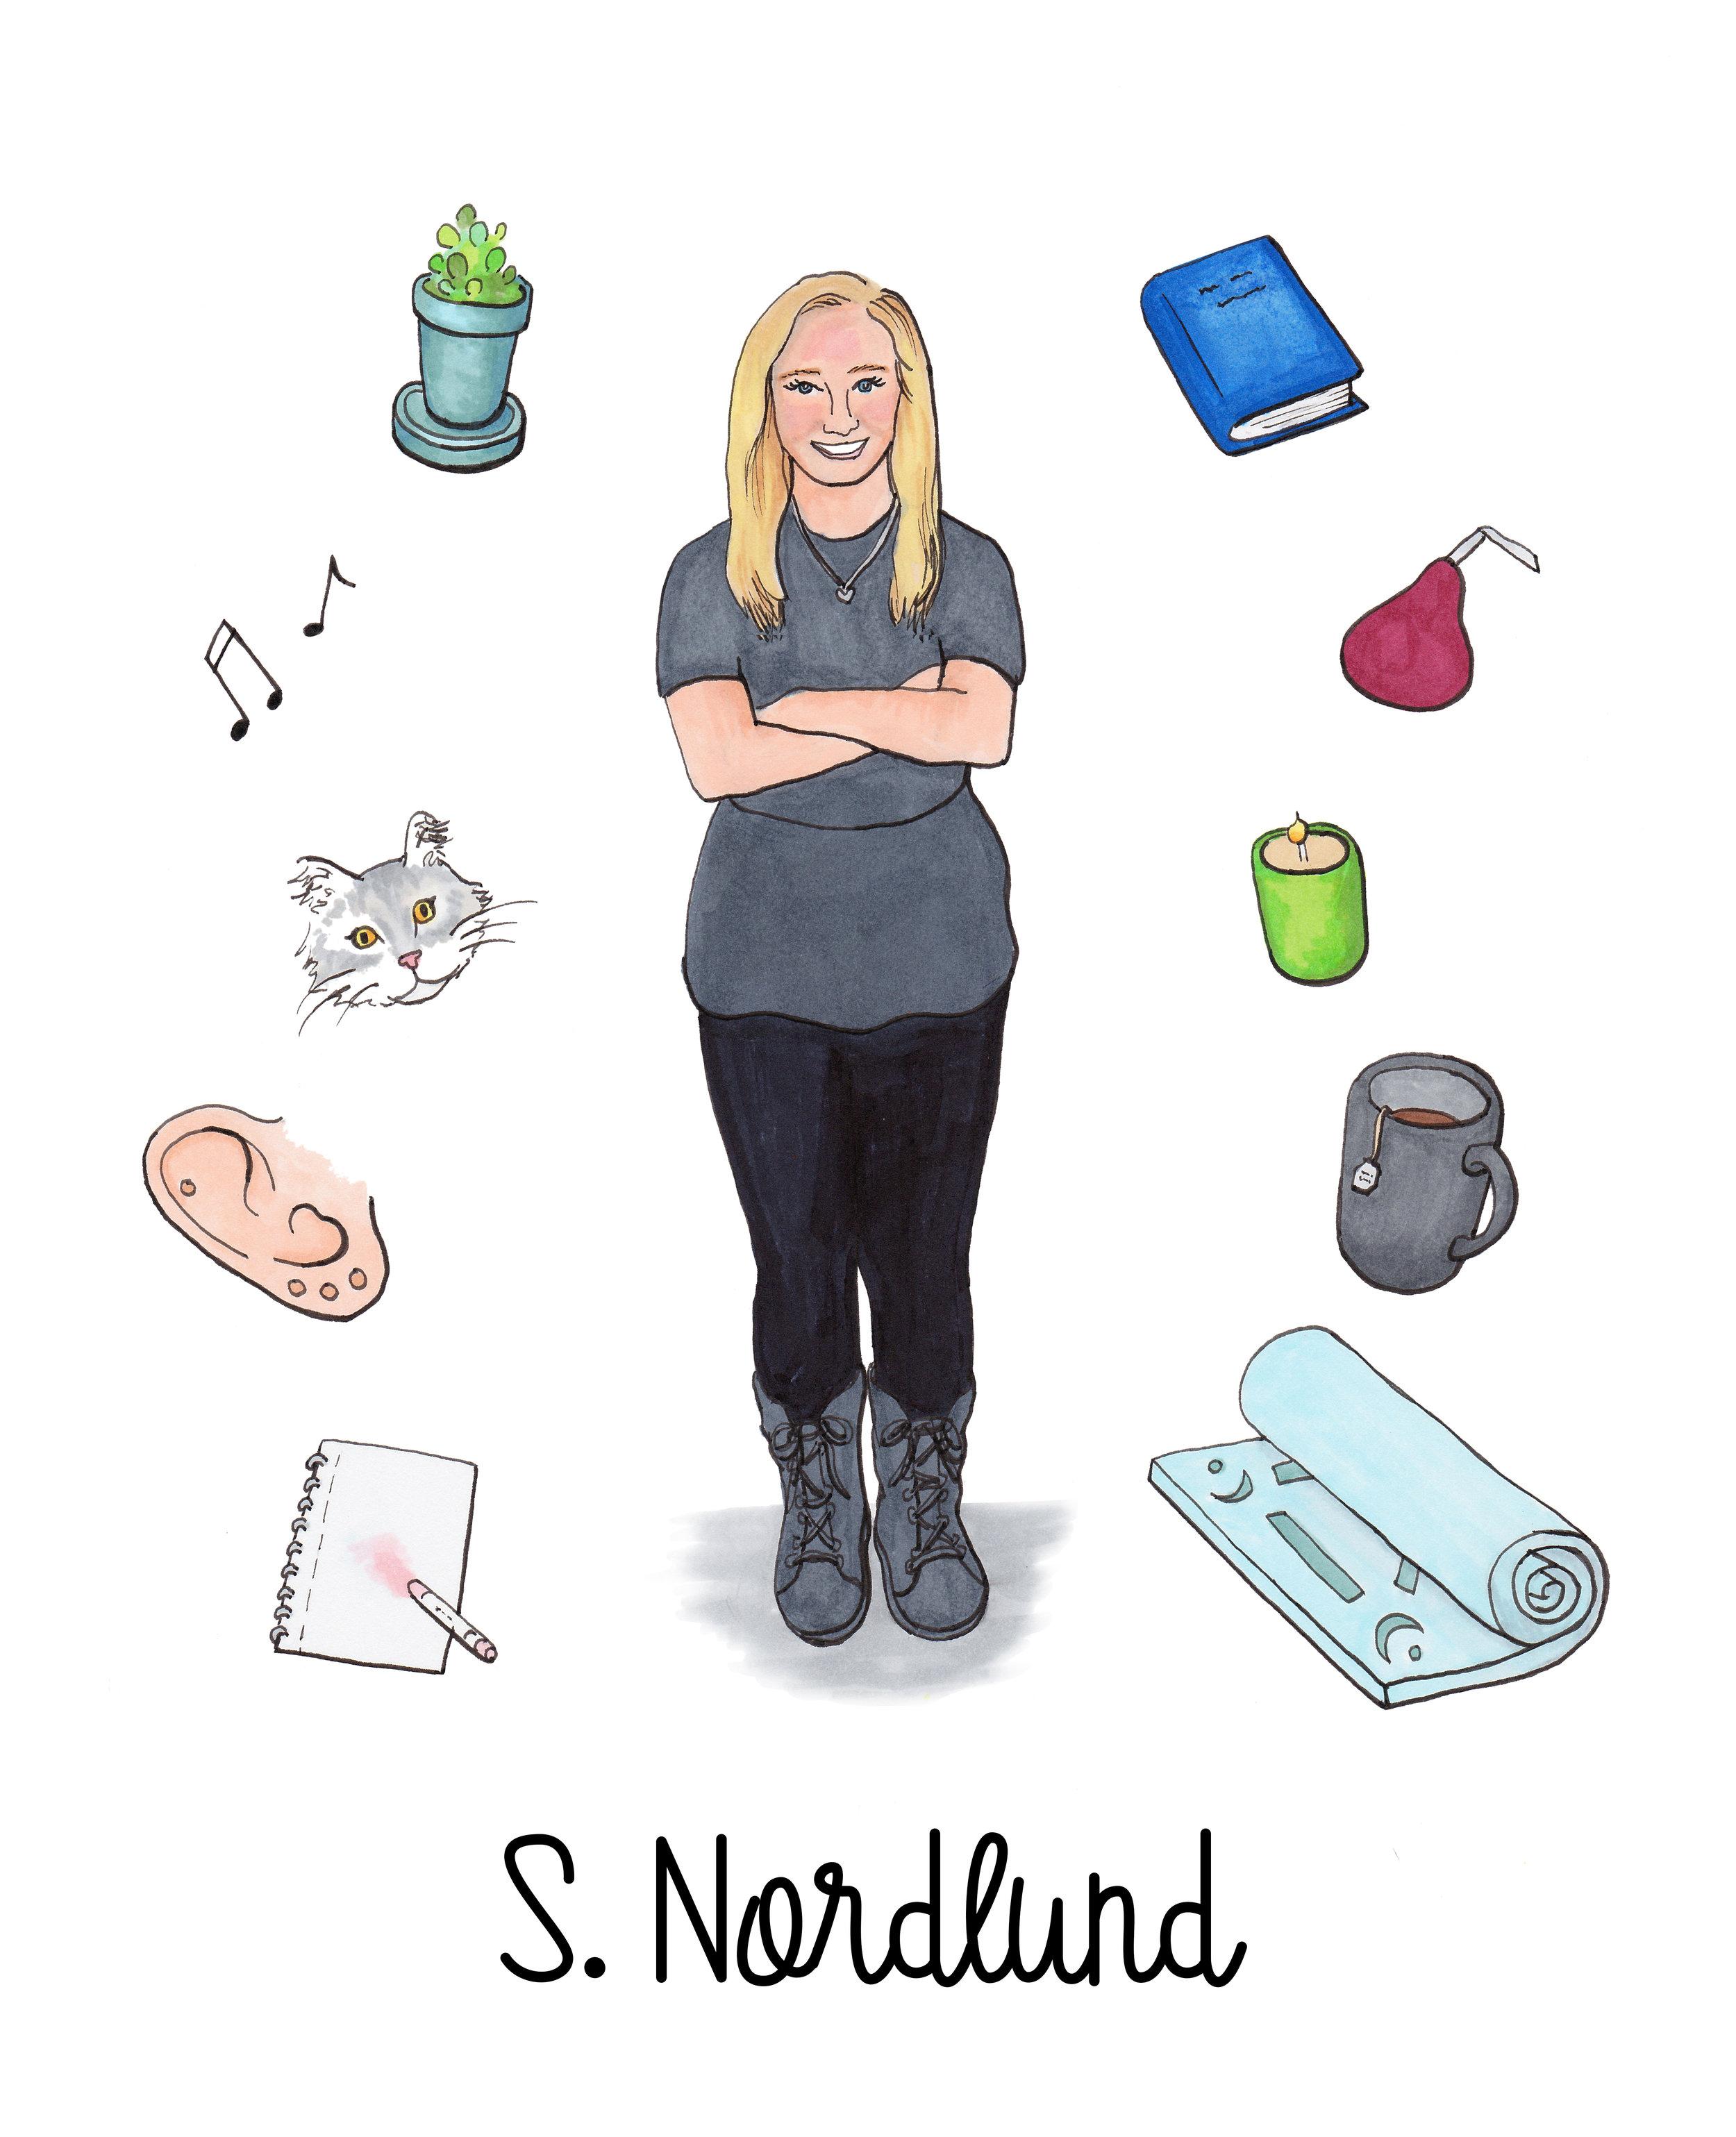 s.nordlunddrawing.jpg